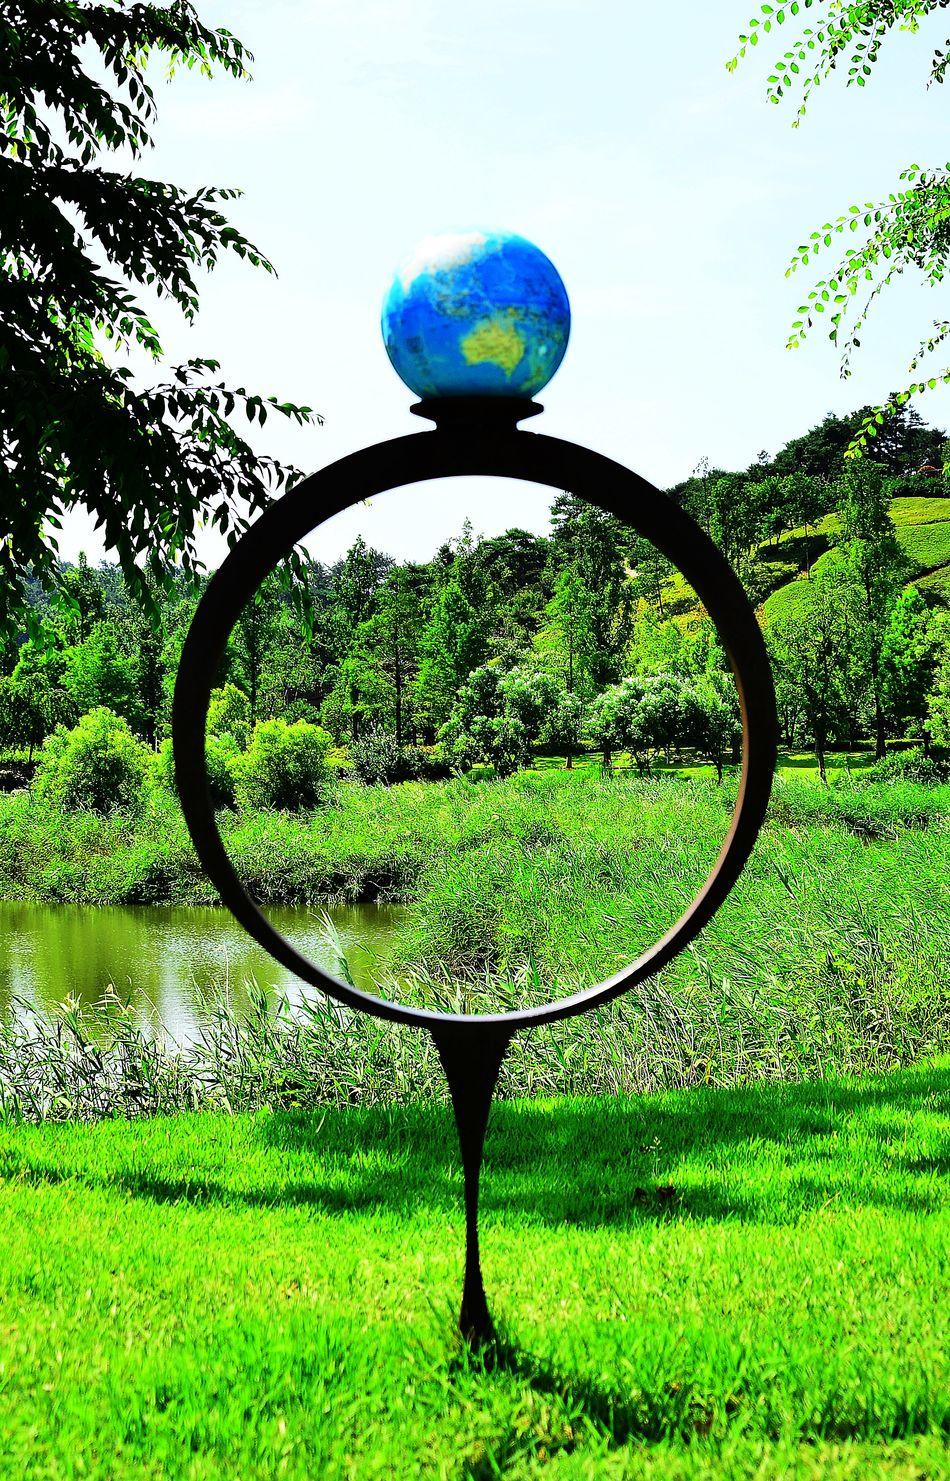 International Garden Exposition Suncheon Beauty In Nature Blue Circle Close-up Garden Garden Architecture Garden Photography Grassy Green Green Color Korea Garden Nature Park Scenics Sky Sphere Tree